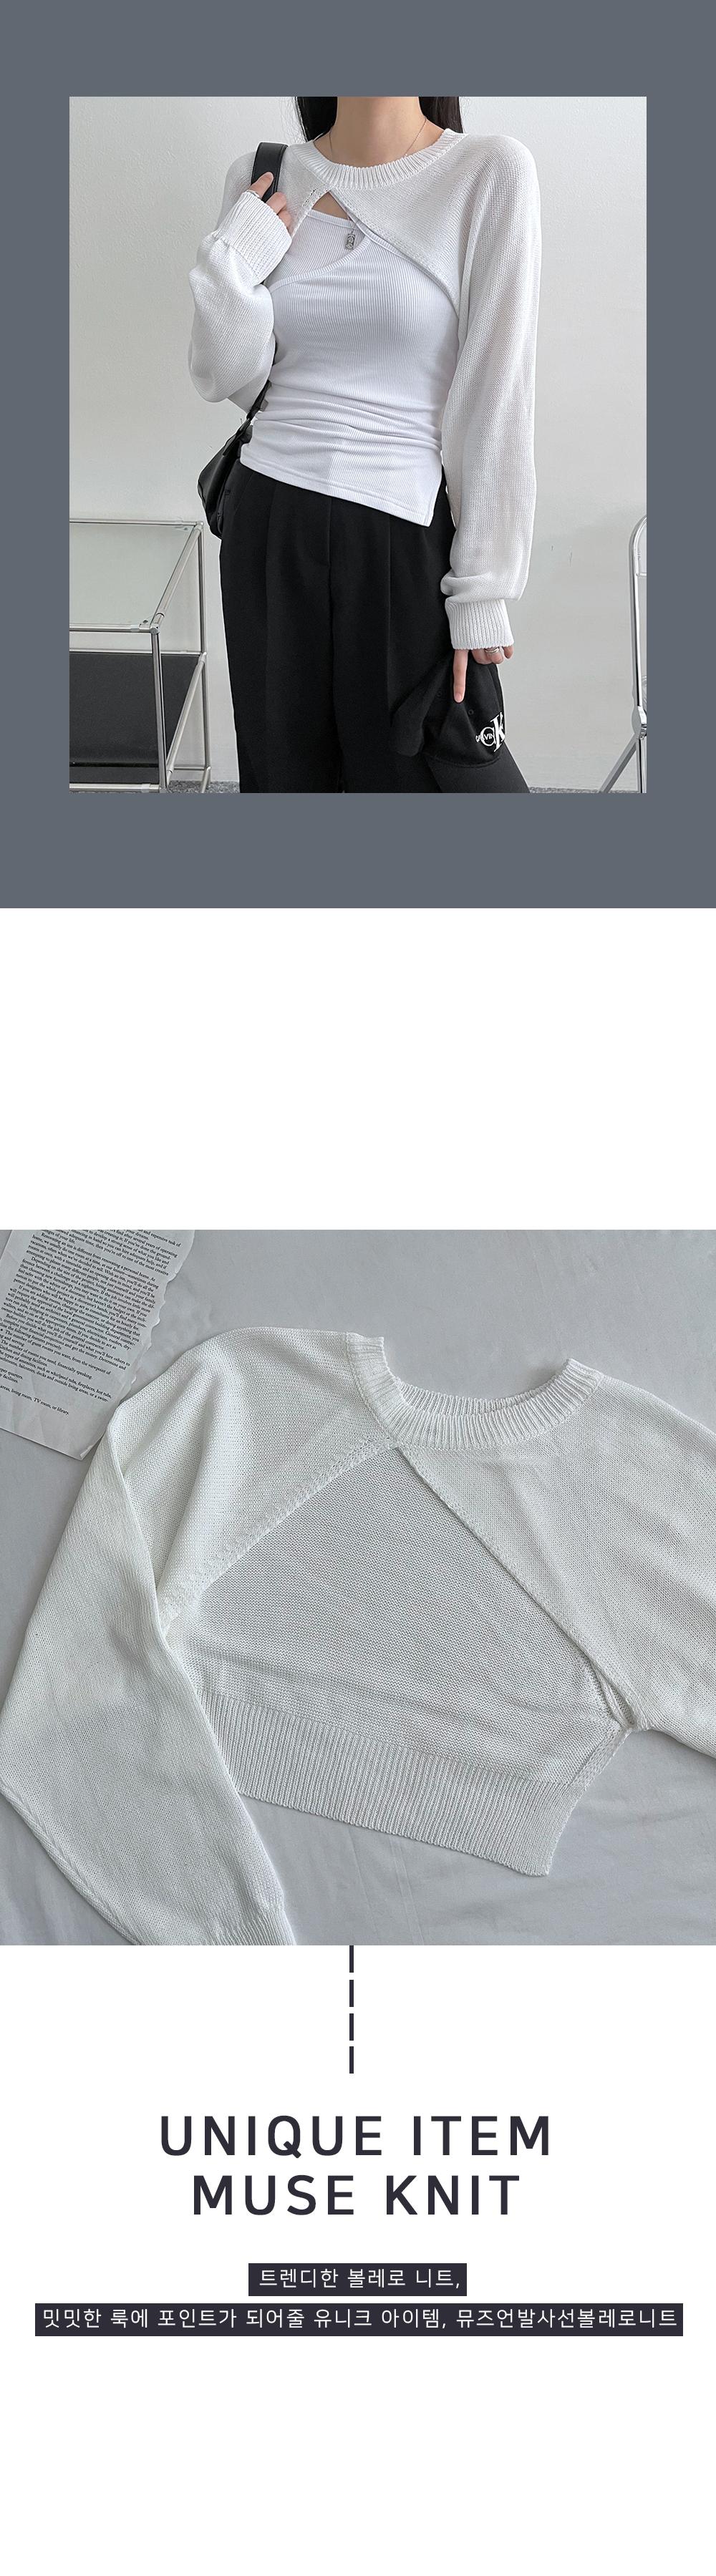 Museon Launcher Bolero Knitwear